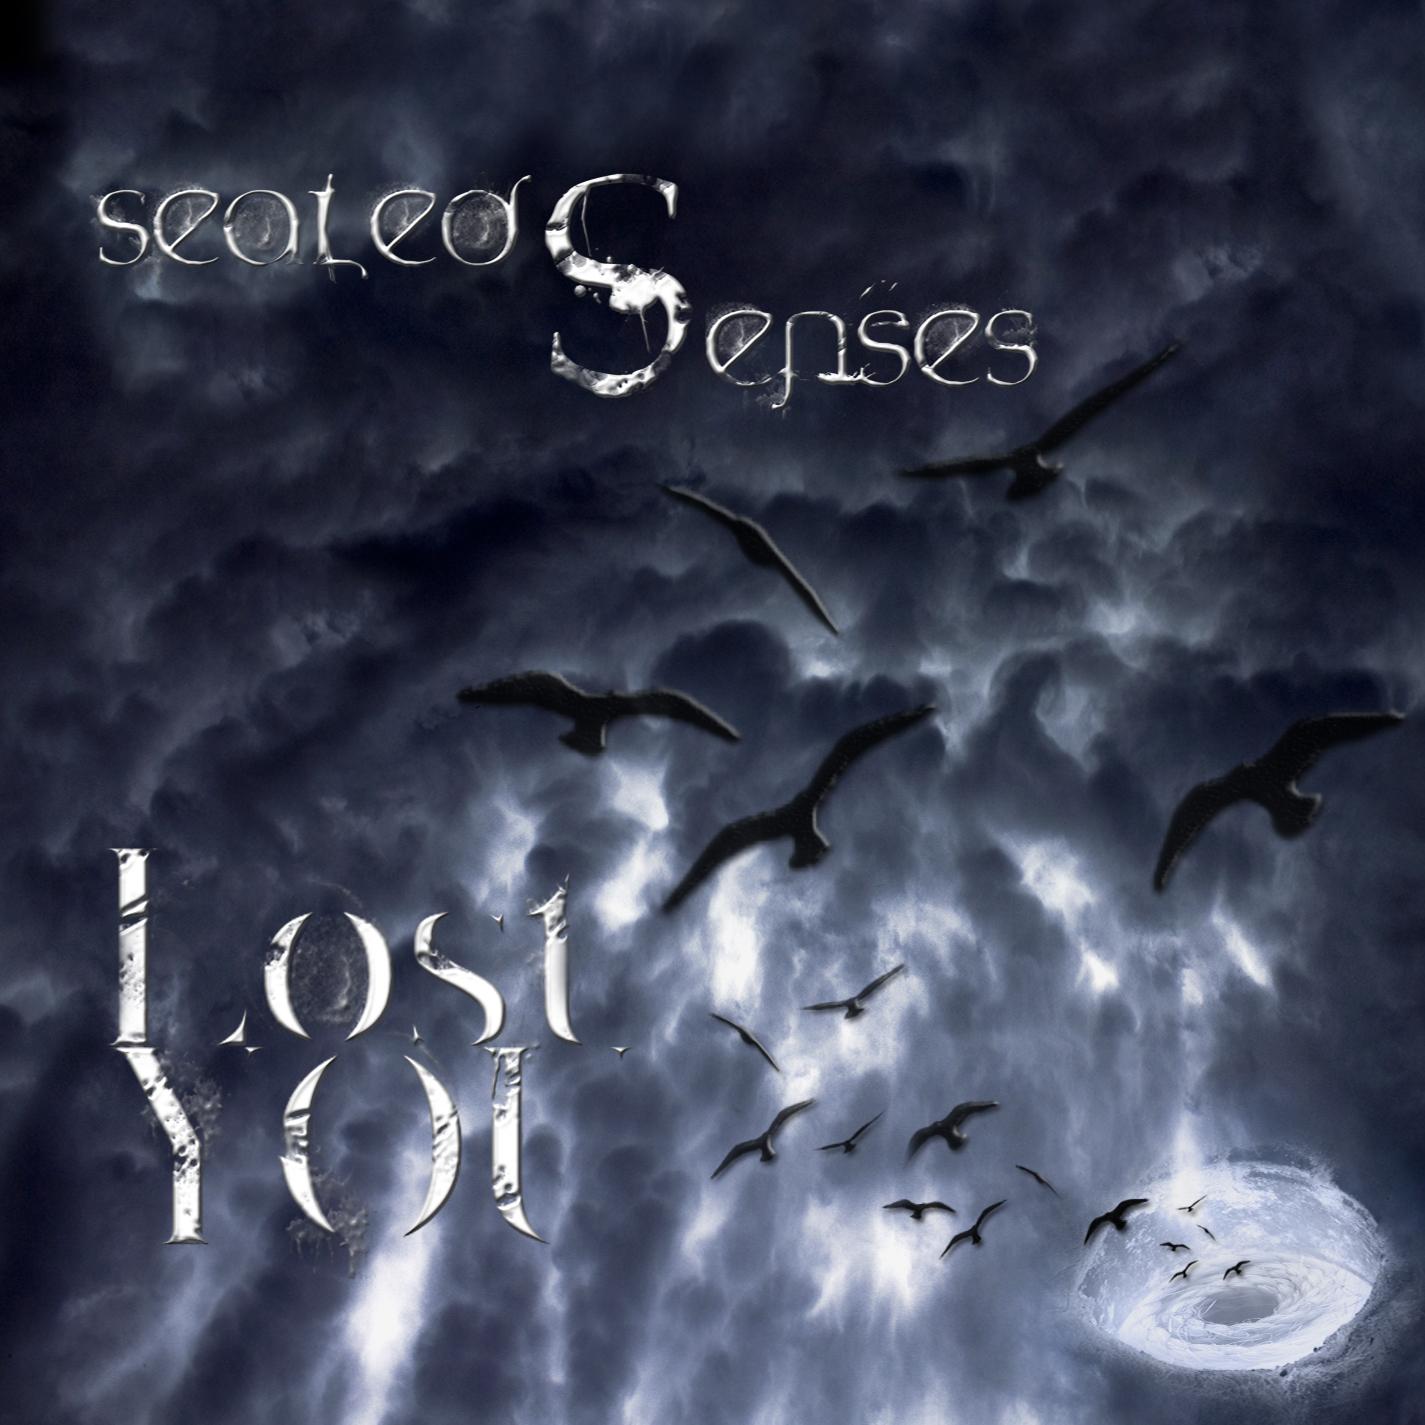 SealedSenses – Lost You